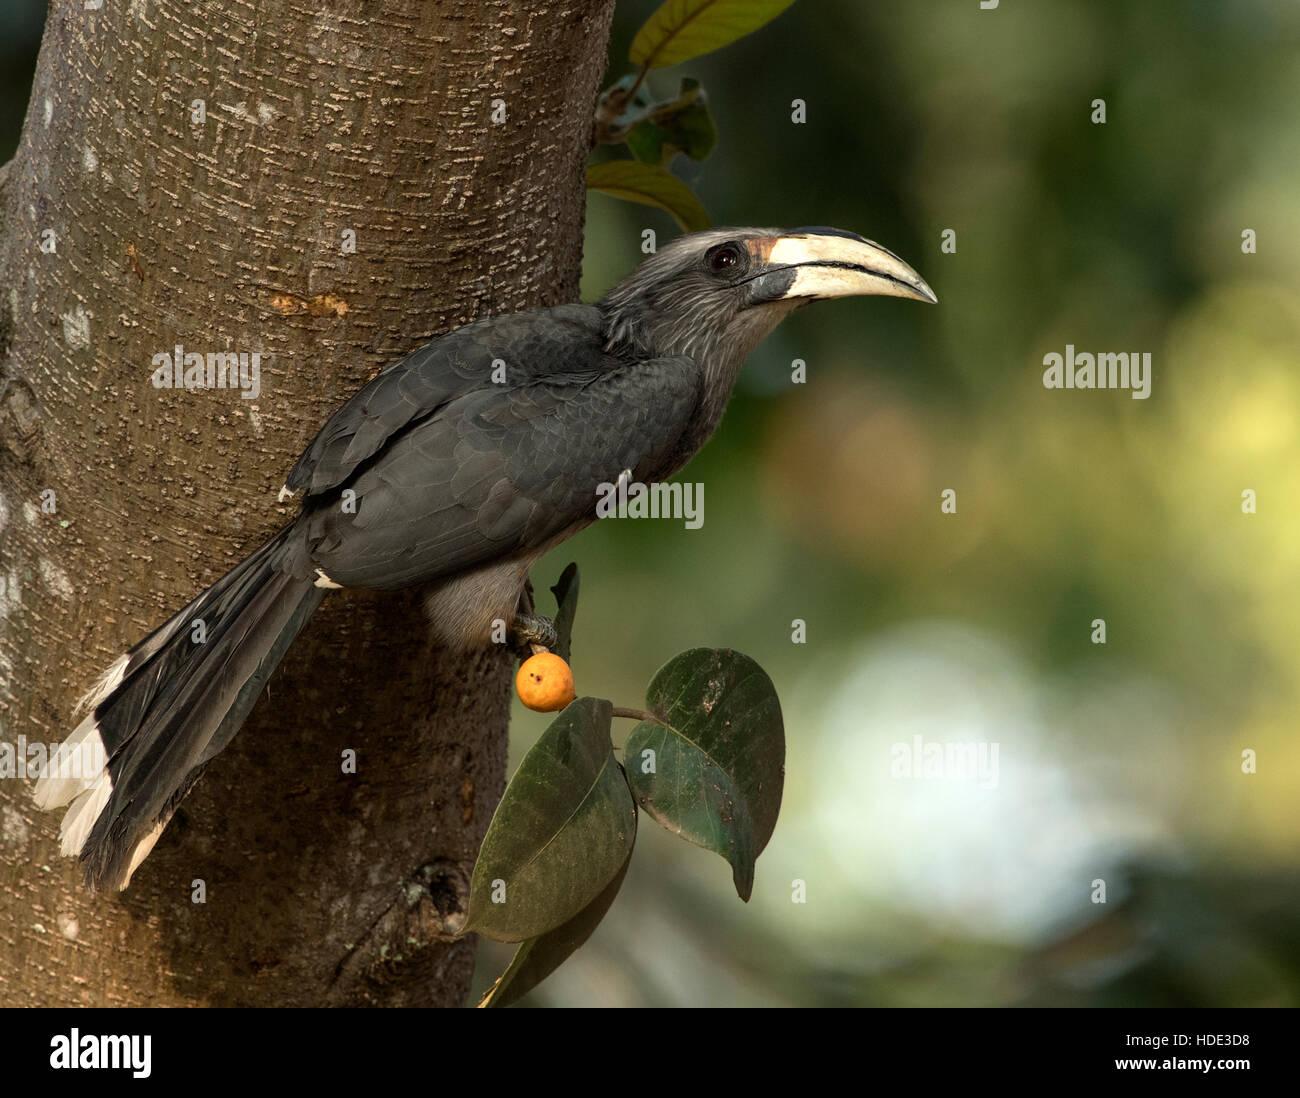 The image of Malabar Grey Hornbill (  Ocyceros griseus) was taken in Dandeli wildlife sanctuary, Karnatka, India Stock Photo